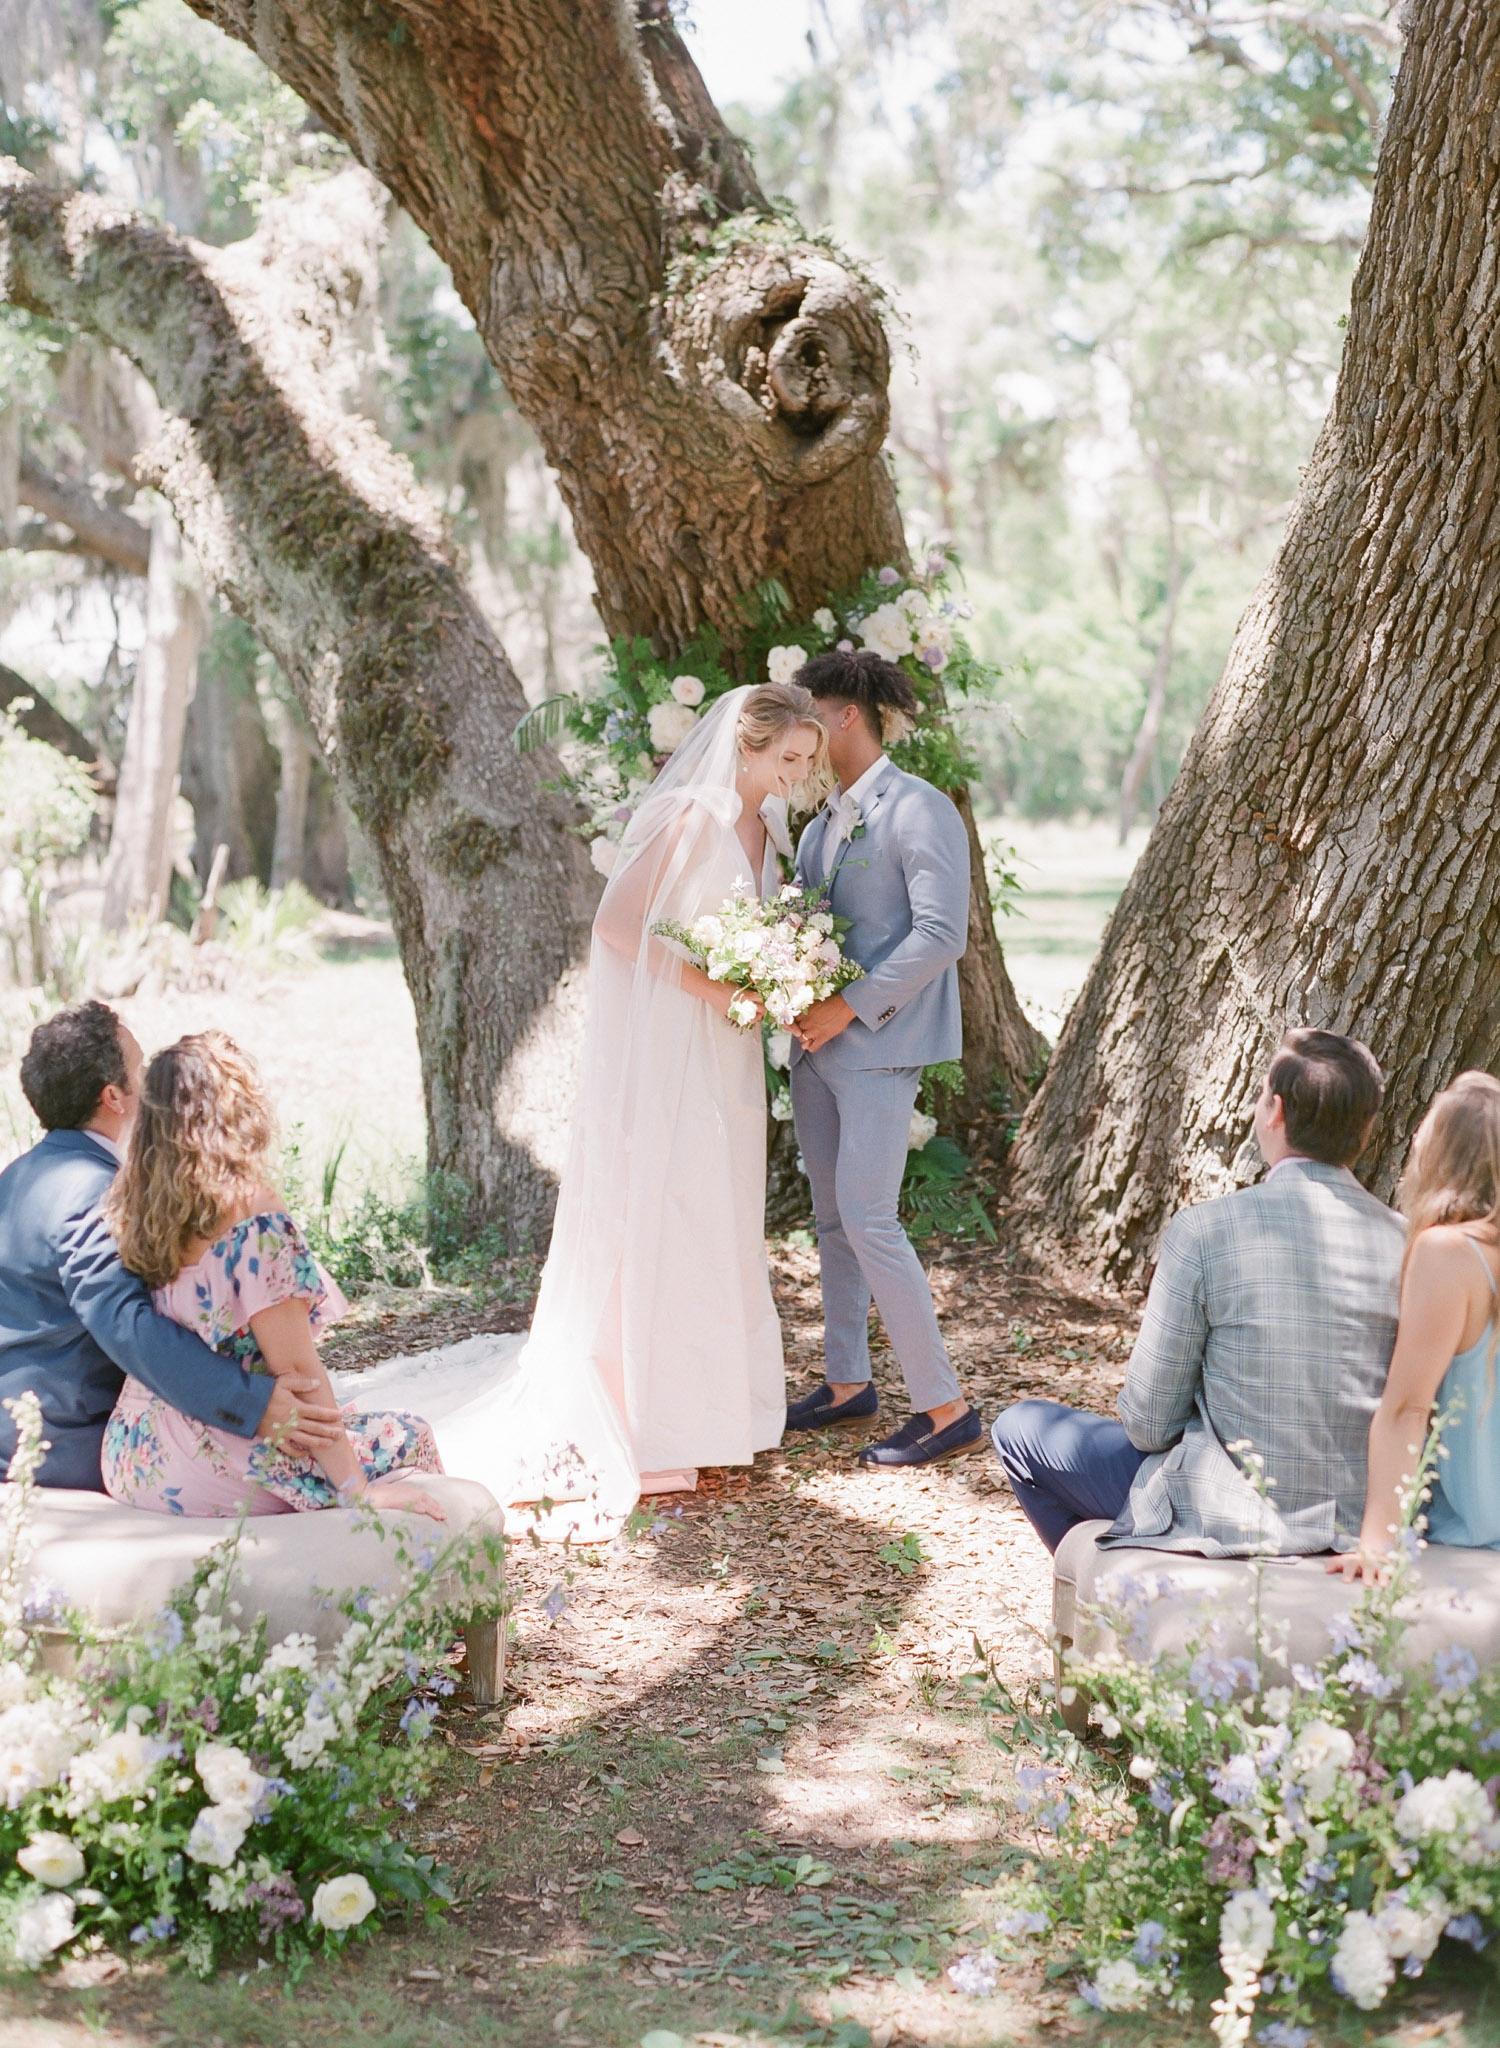 Charleston-Kiawah-River-Weddings-1-7.jpg